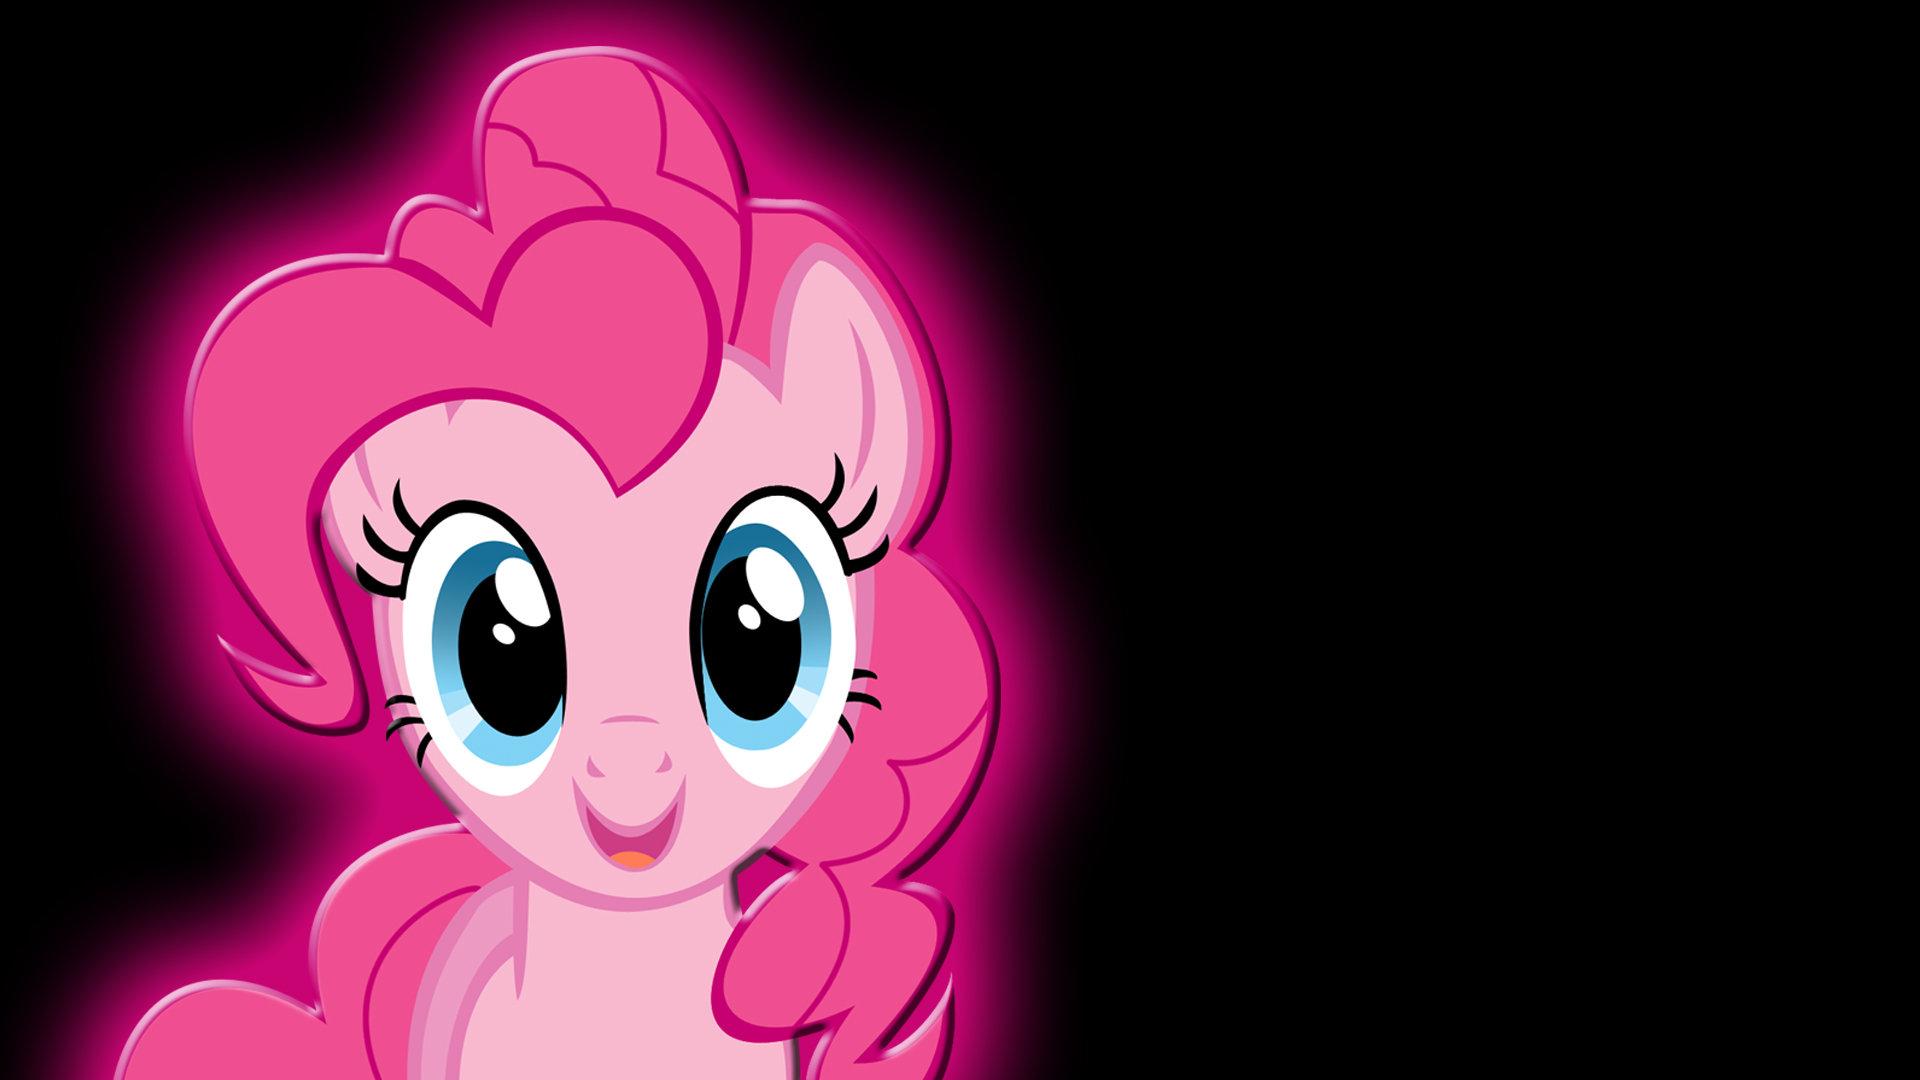 Wallpaper My Little Pony My Little Pony Pinkie Pie Png 1291566